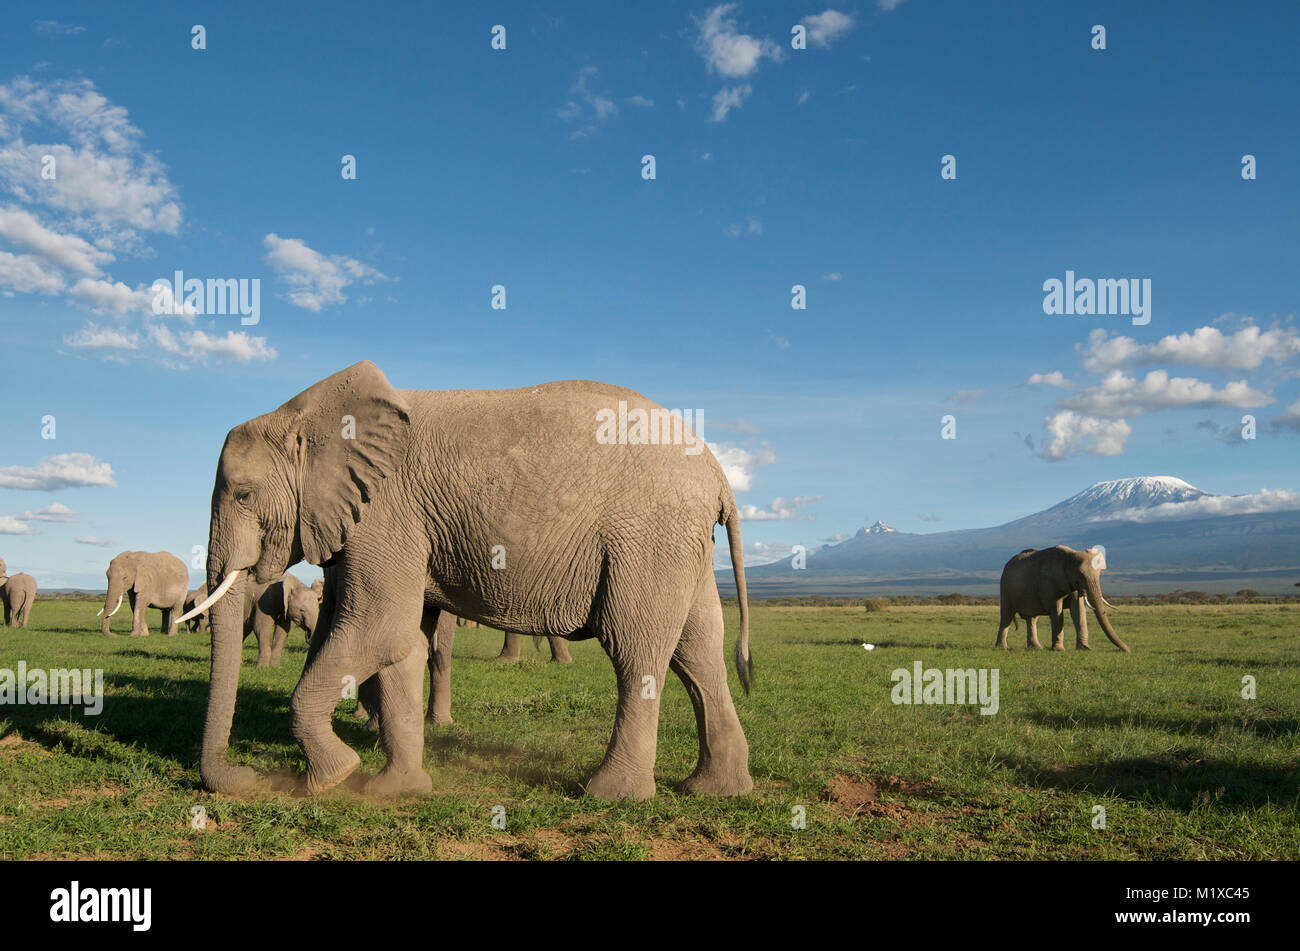 Herd of African Elephants grazing on the savannah with Kilimanjaro in the background. Amboseli. Kenya. - Stock Image